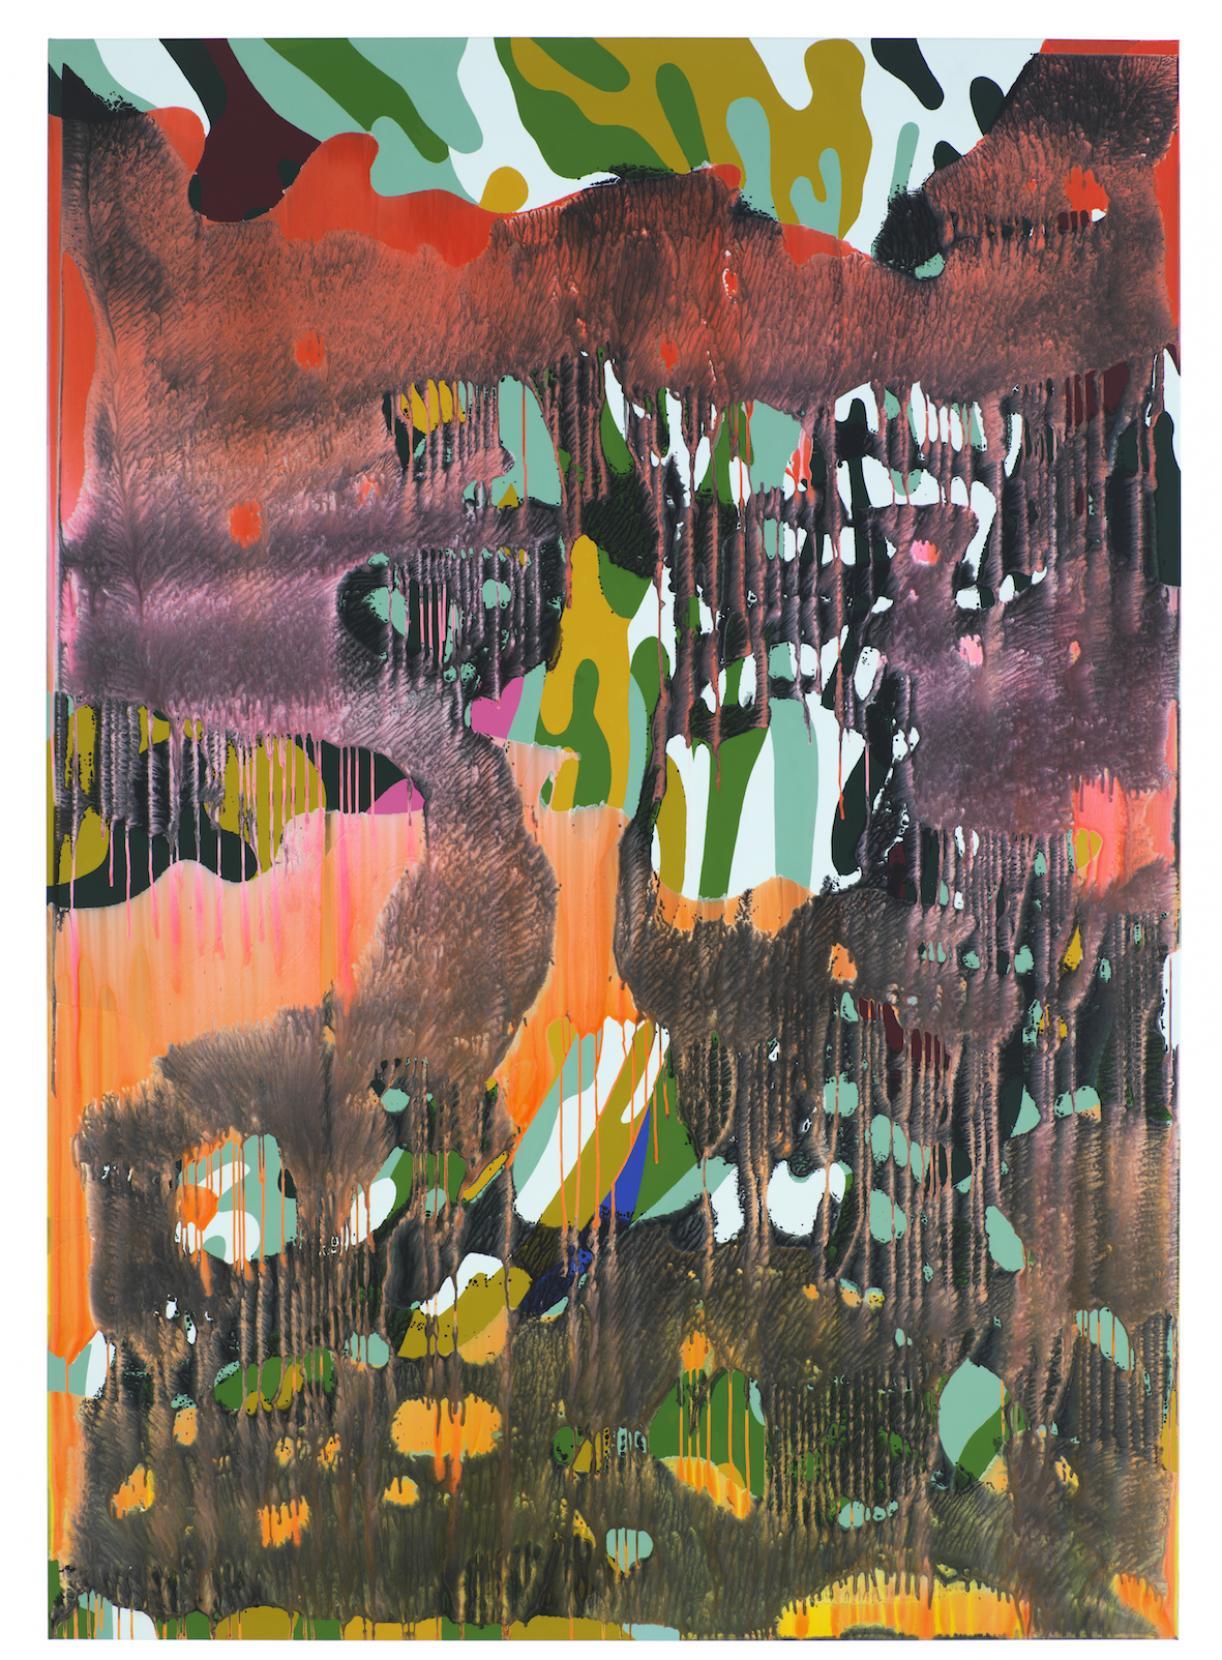 Christine Streuli, Warainting_002, 2016/17, Mixed media on canvas, 243,5 x 173 cm